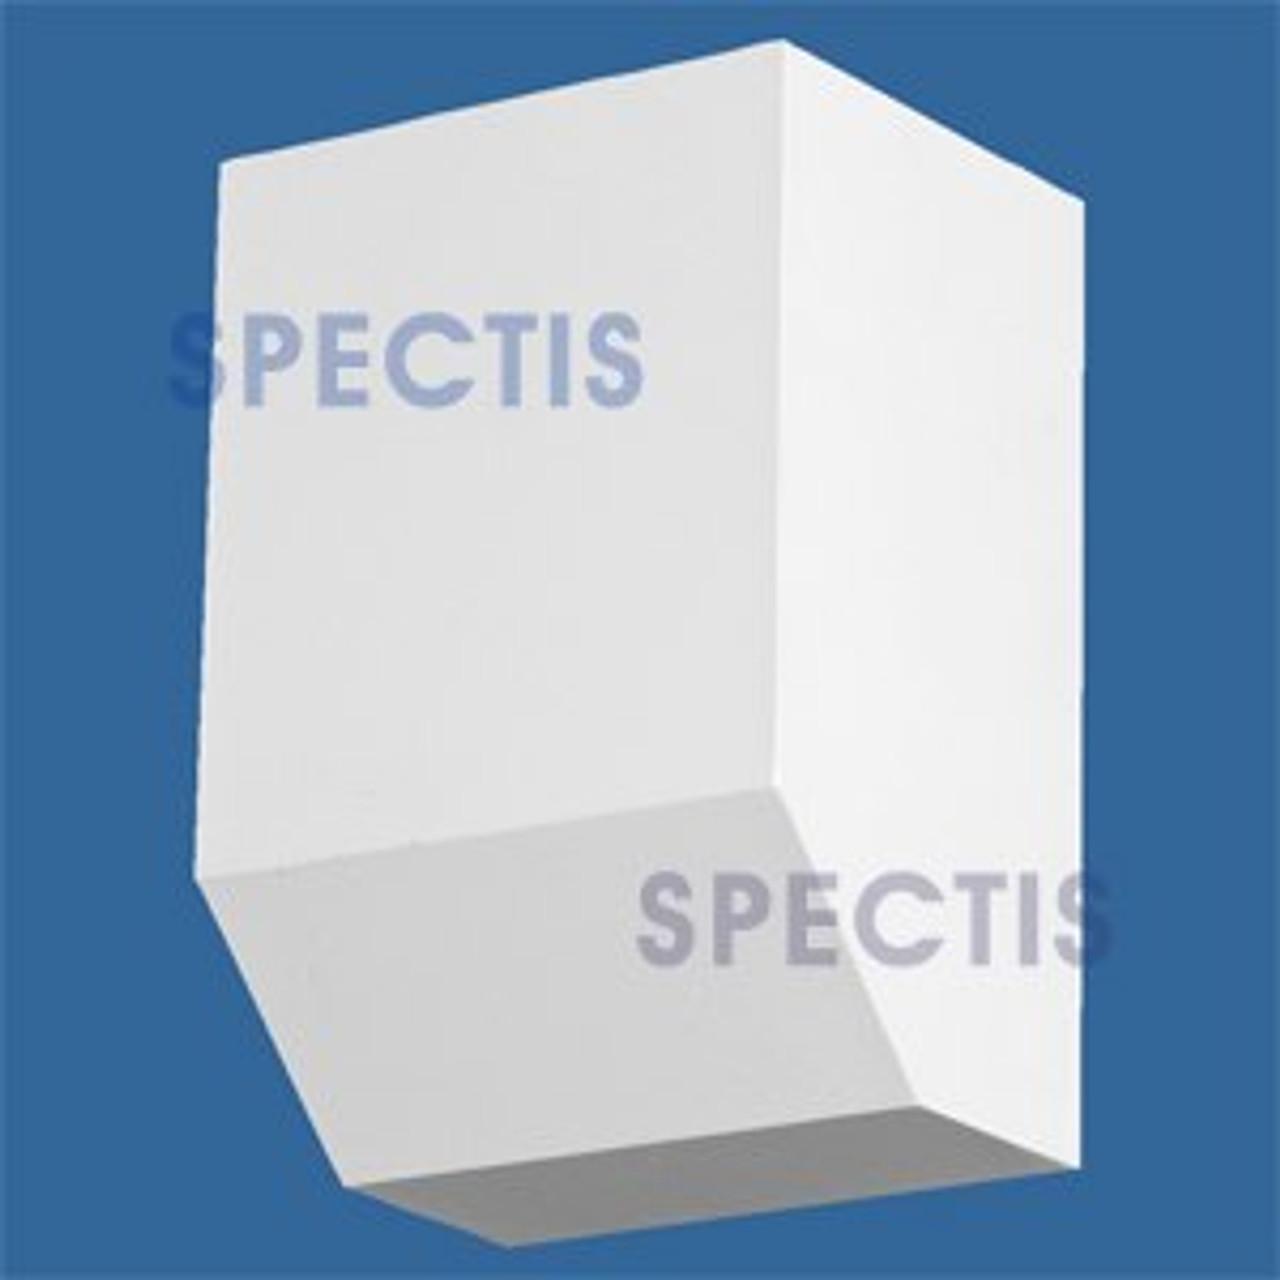 "BL2940 Corbel Block or Eave Bracket 5.5""W x 8""H x 4.5"" P"